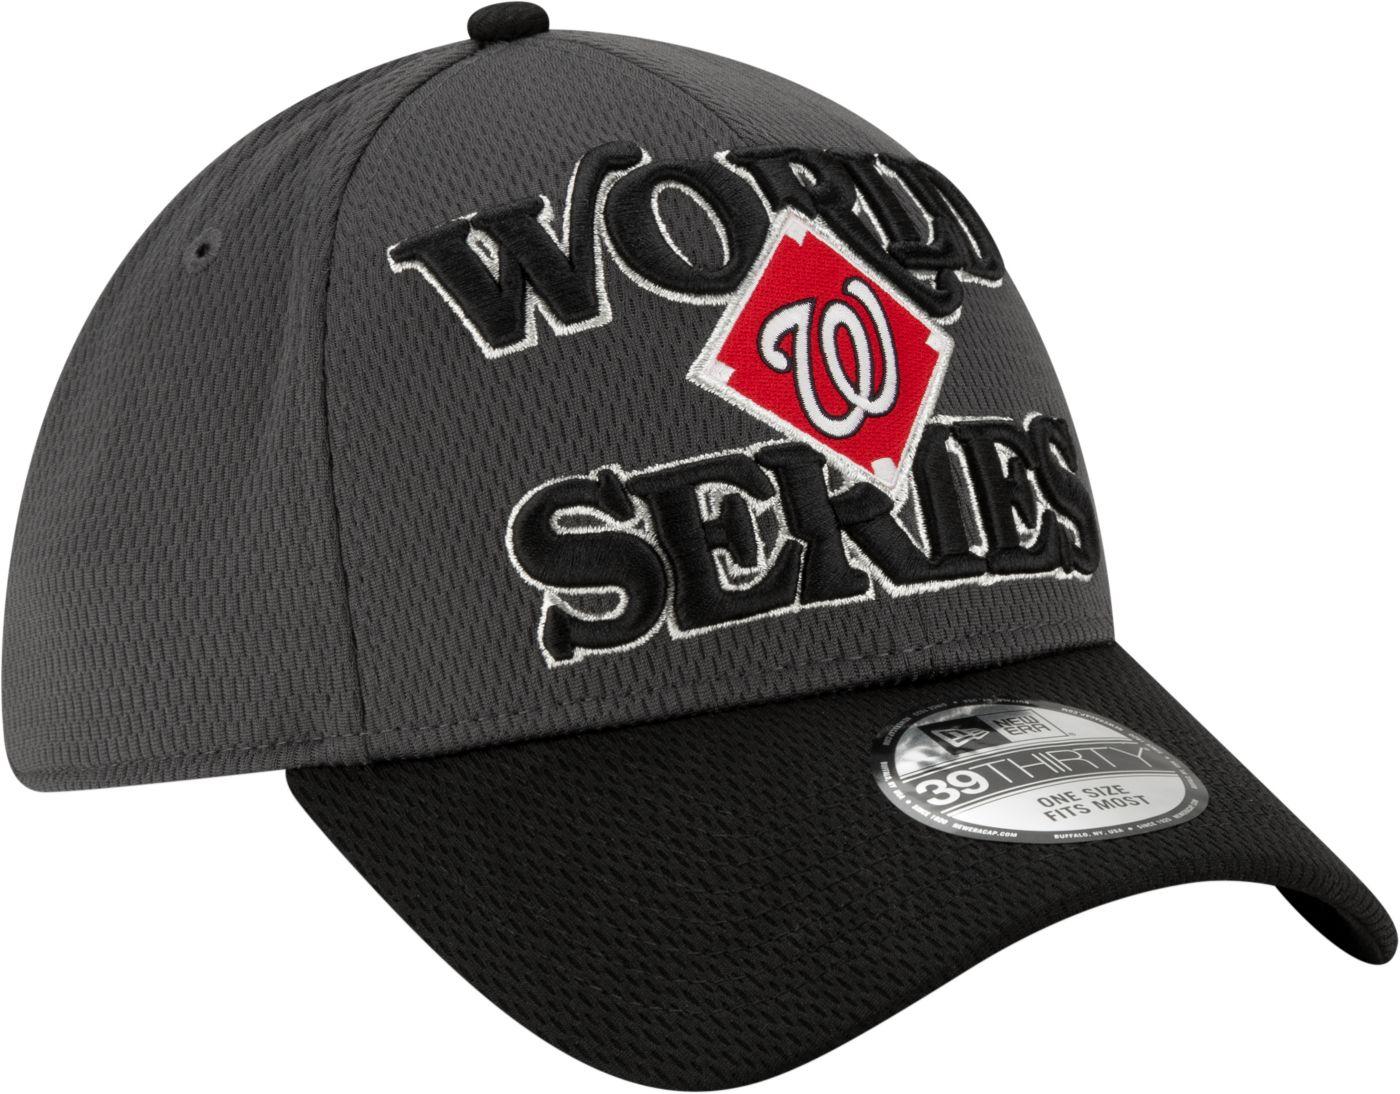 New Era Men's 2019 National League Champions Locker Room 39Thirty Washington Nationals Stretch Fit Hat